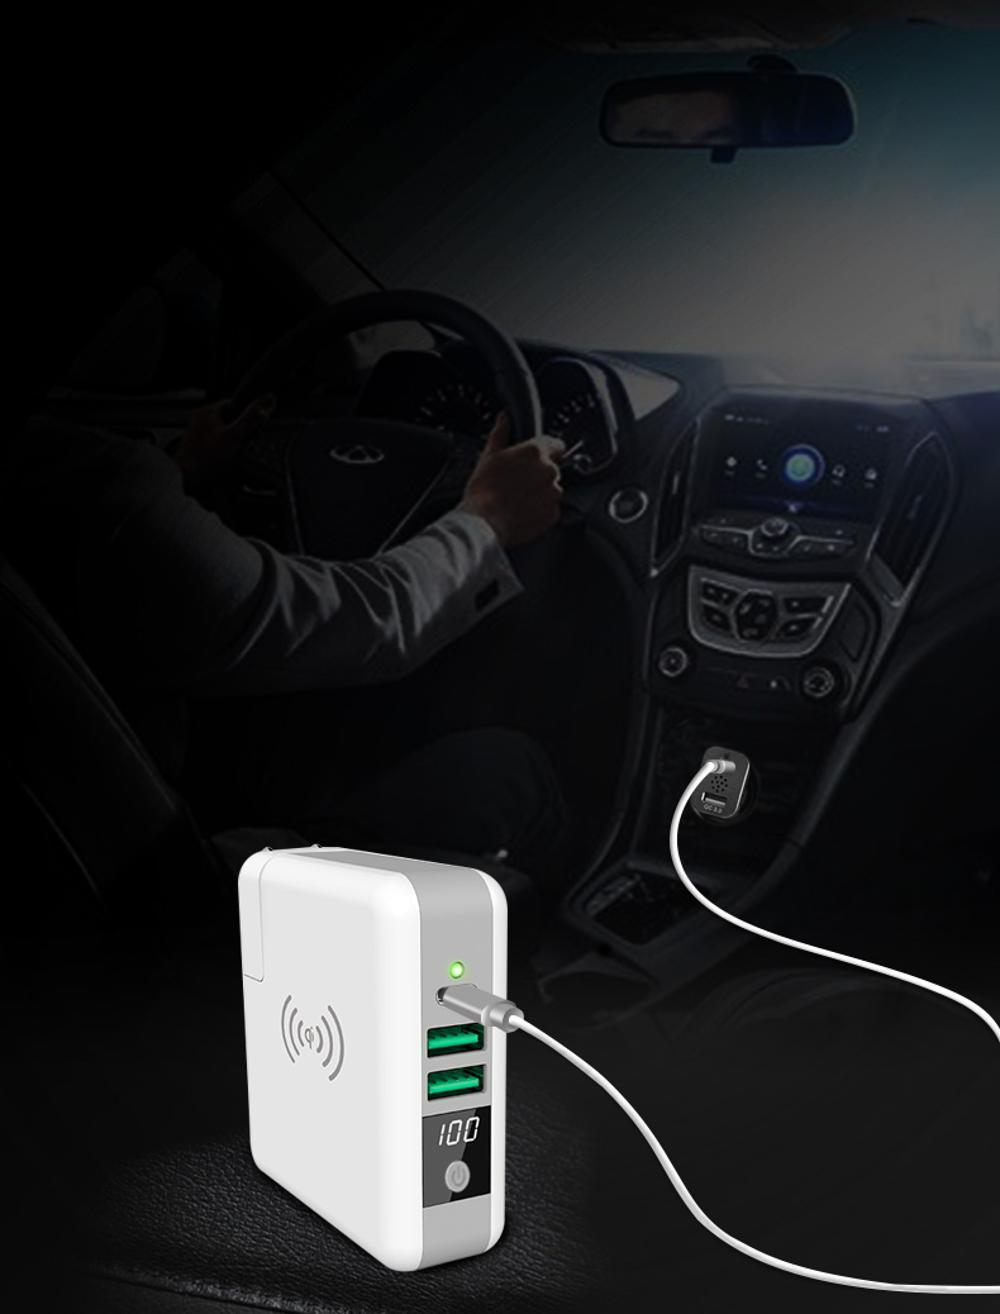 Wholesale universal travel charger Qi wireless mulifunctional power bank 6700mAh 14